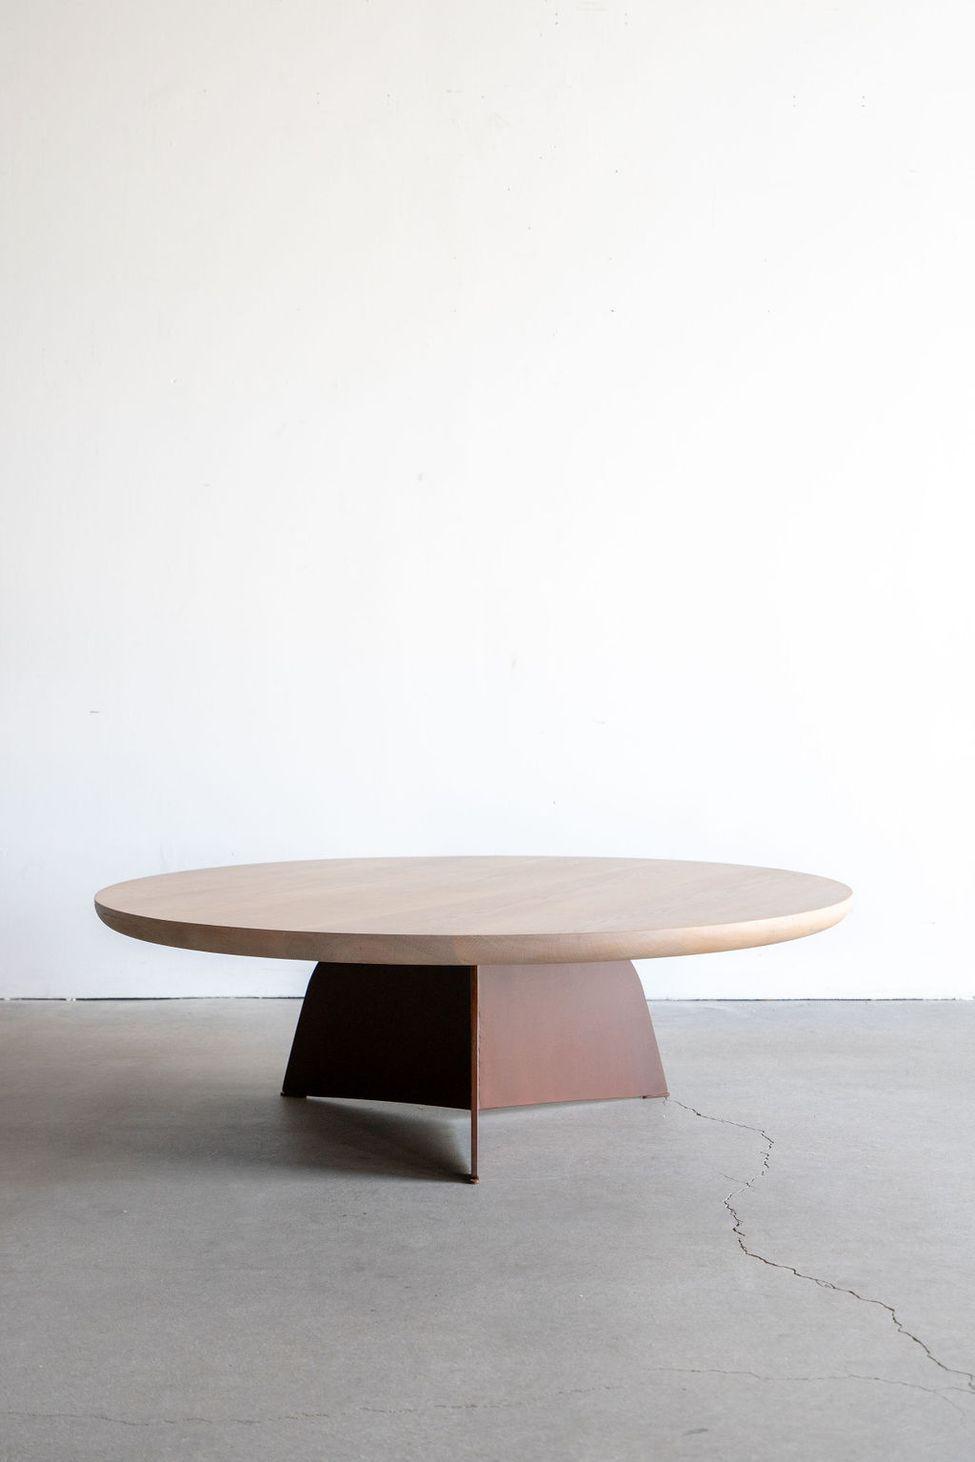 Terrific Tula Coffee Table Furniture Decor In 2019 Table Ibusinesslaw Wood Chair Design Ideas Ibusinesslaworg